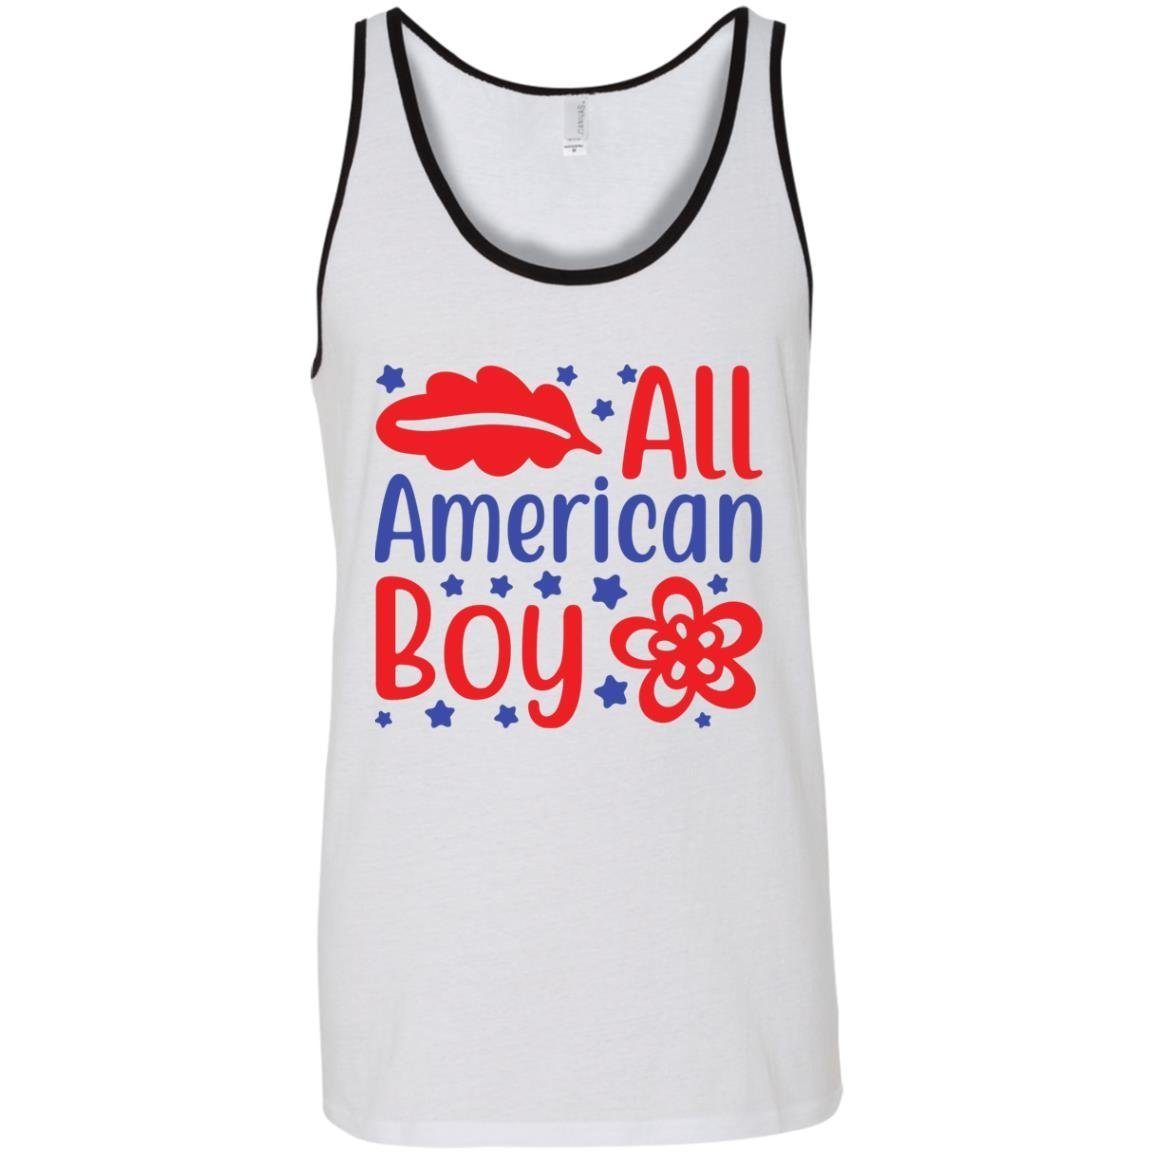 All American Boy Unisex Tank Top